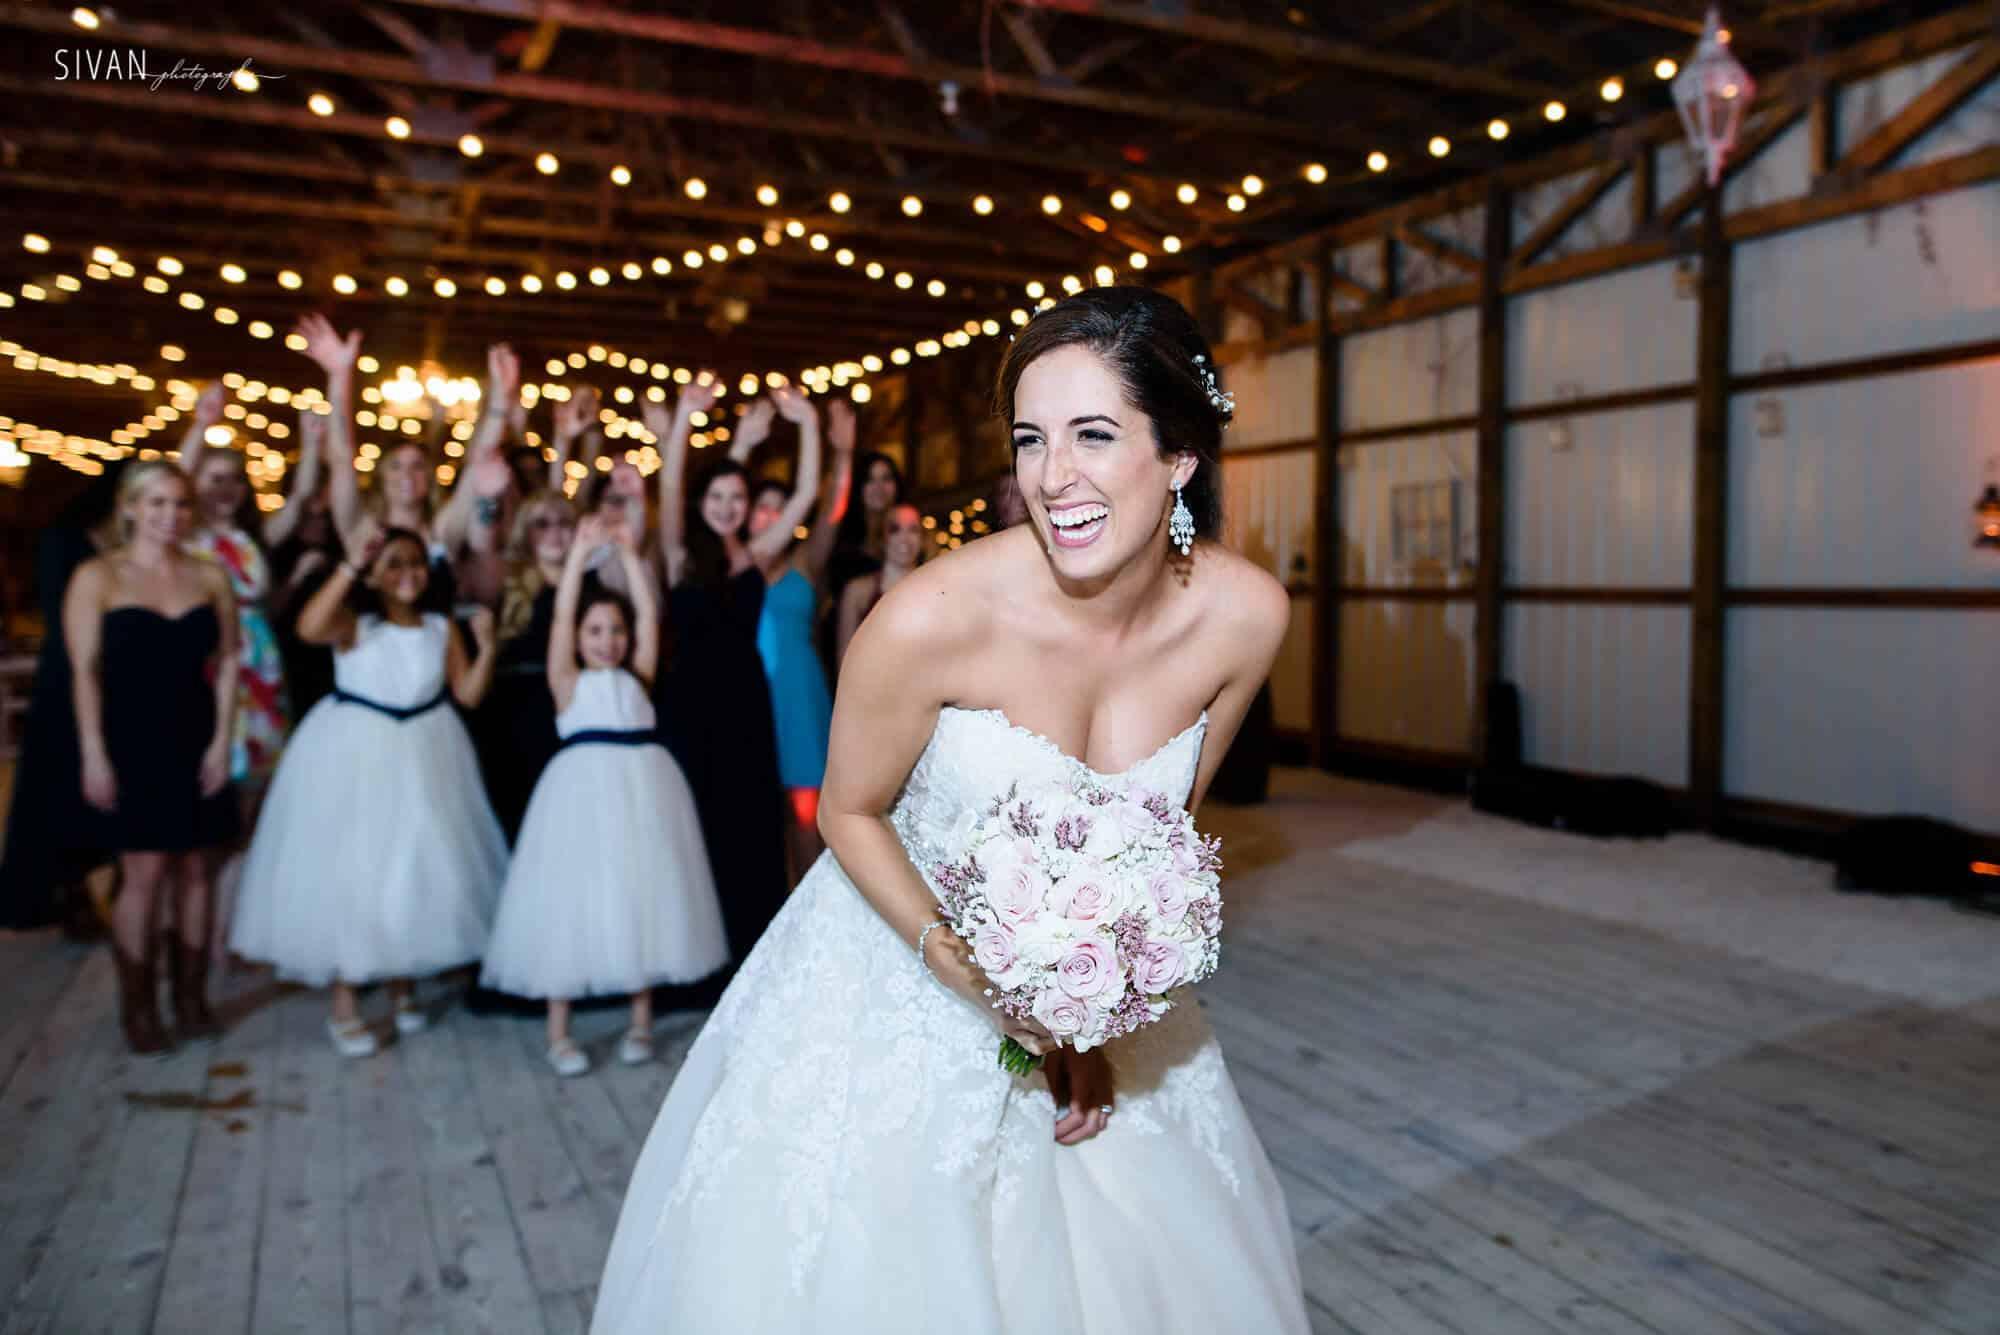 Orlando Wedding DJ - Bouquet Toss Song Suggestions